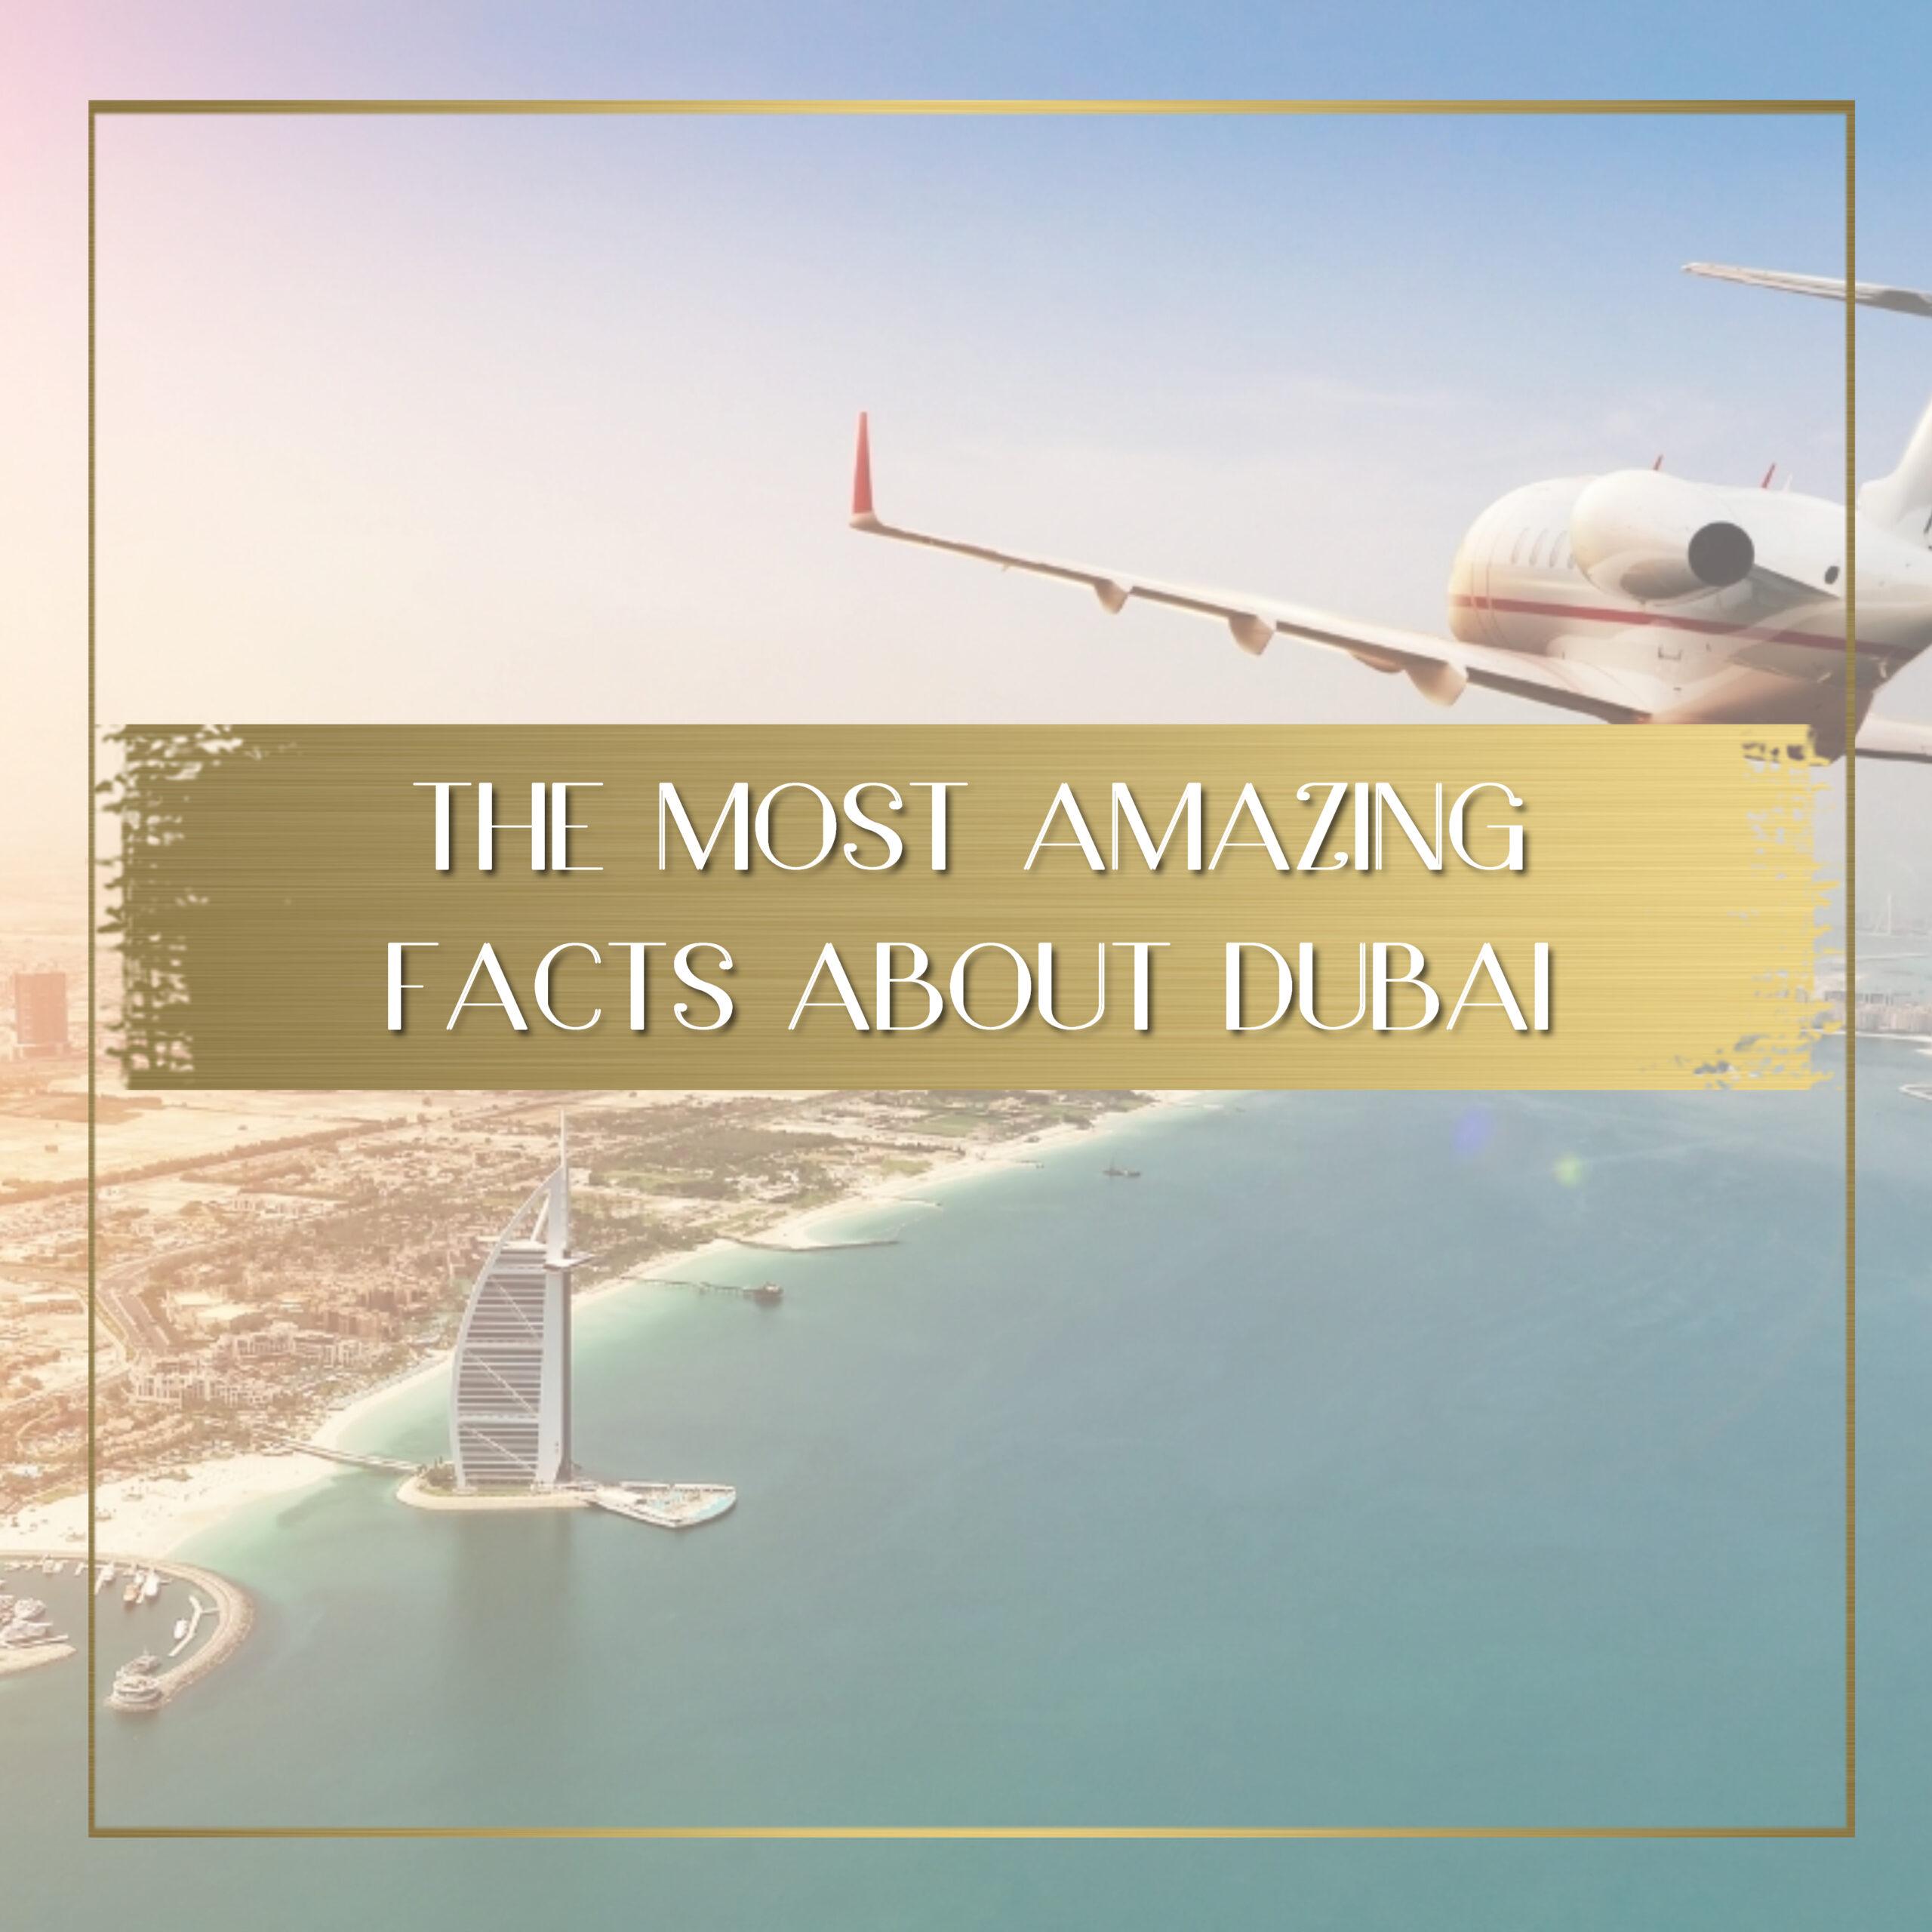 Facts about Dubai feature